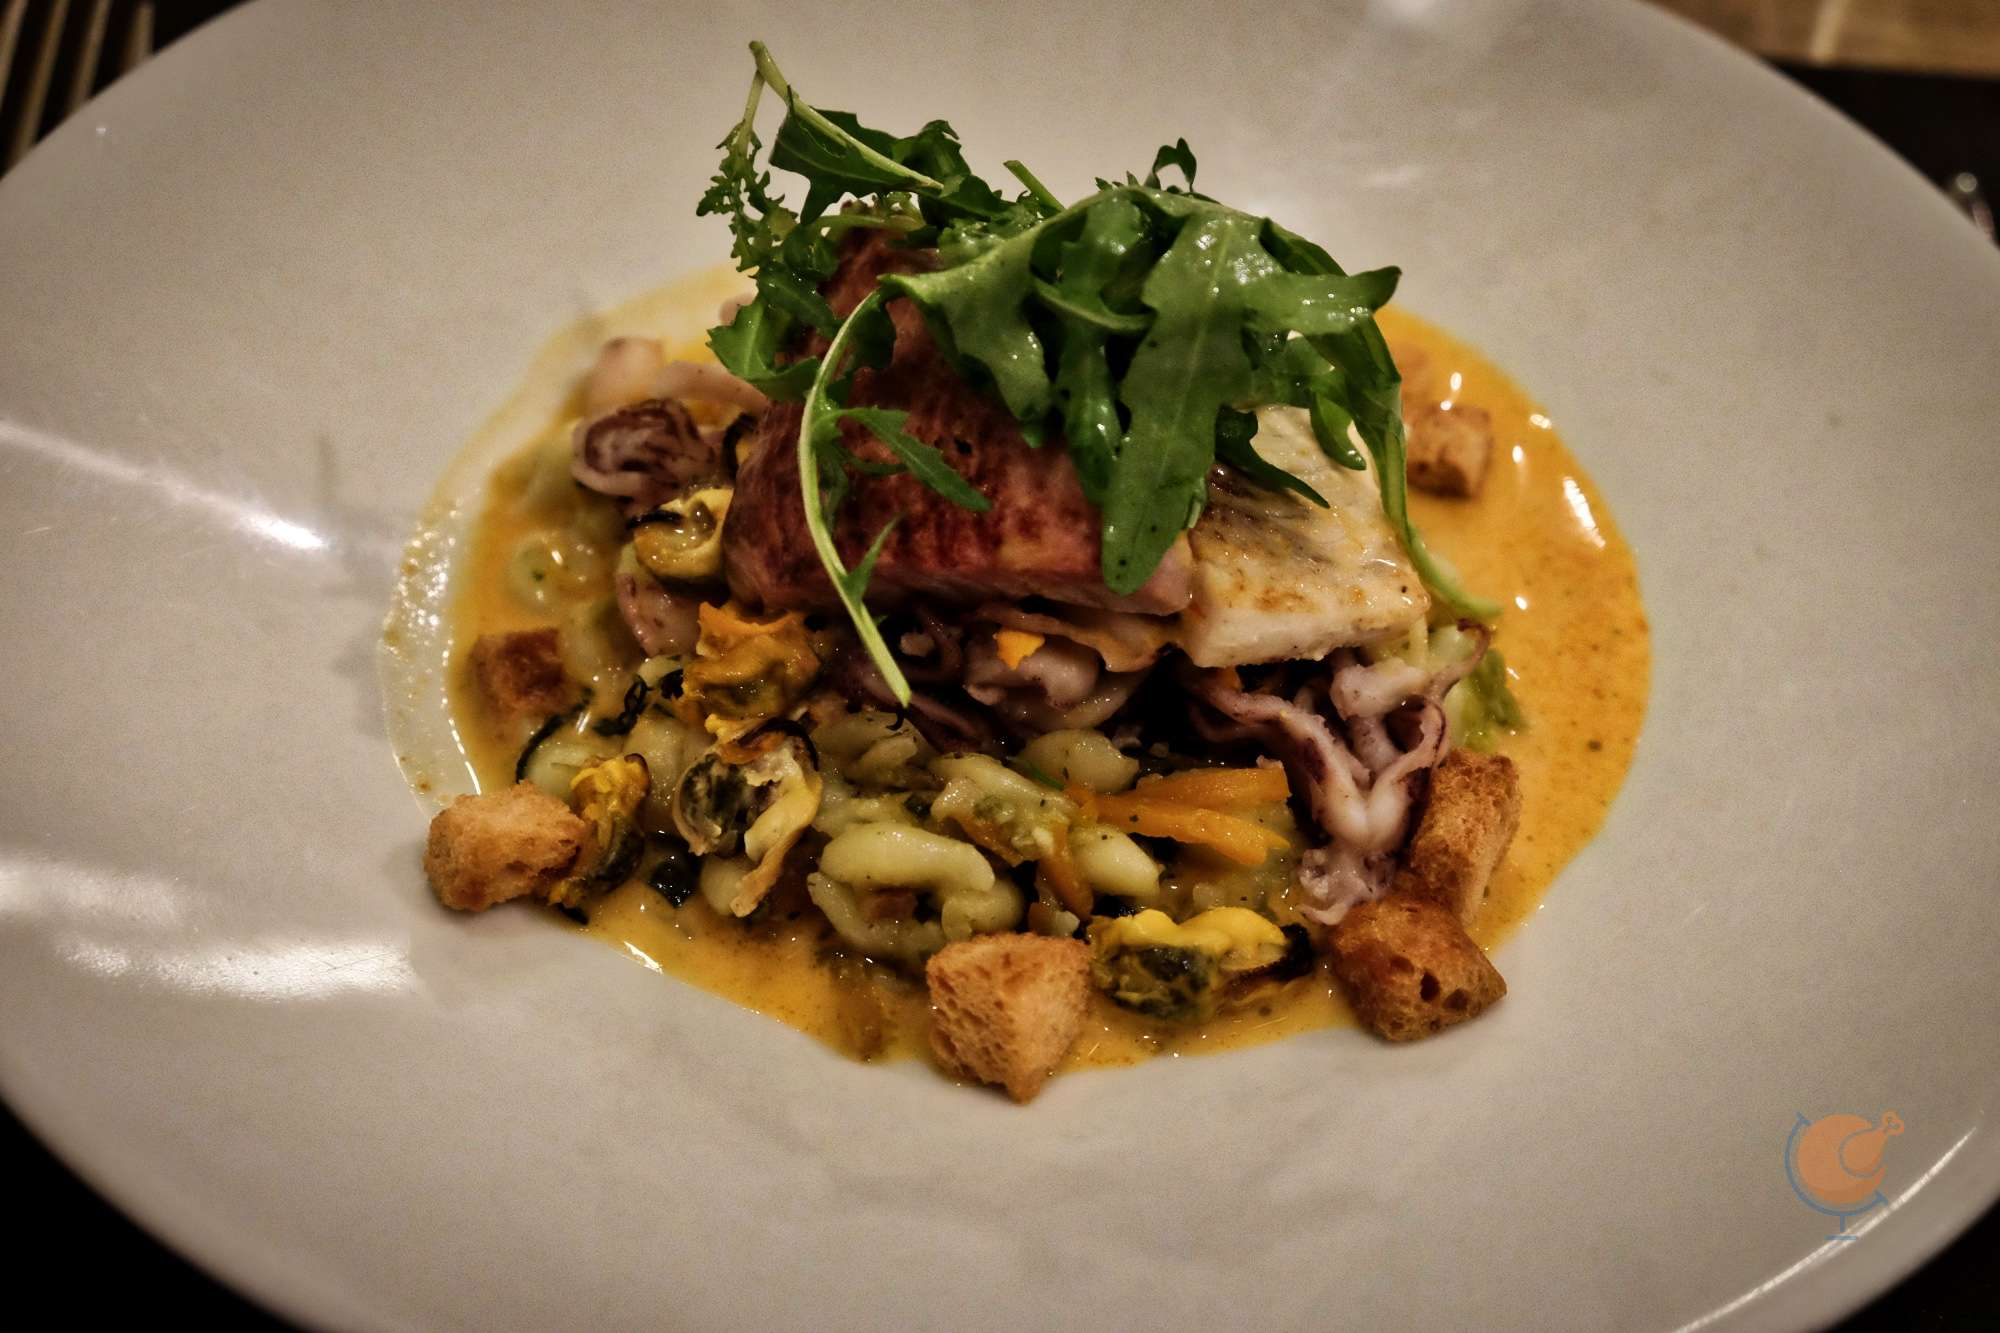 dscf1431_bar_des_oiseaux_restaurant_france_nice_nizza_vilagevo_jokuti_andras_l_w.jpg